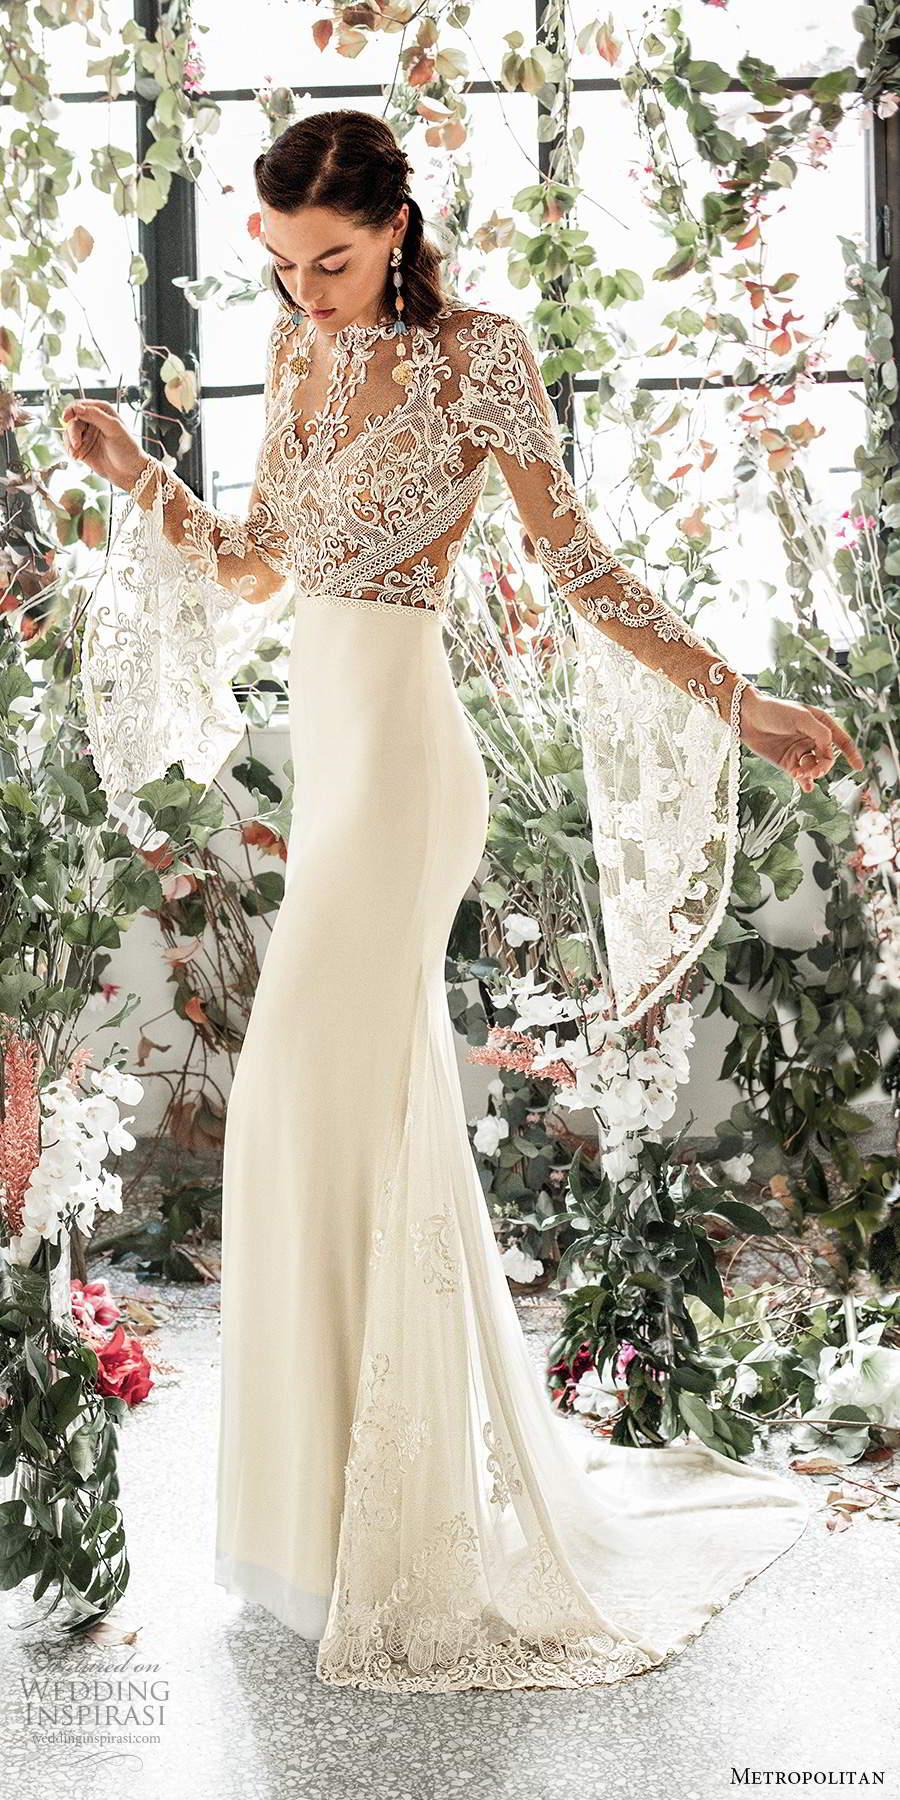 metropolitan spring 2020 bridal illusion long flare sleeves jewel neckline sheer lace embellished bodice sheath a line wedding dress keyhole back sweep train (3) sv